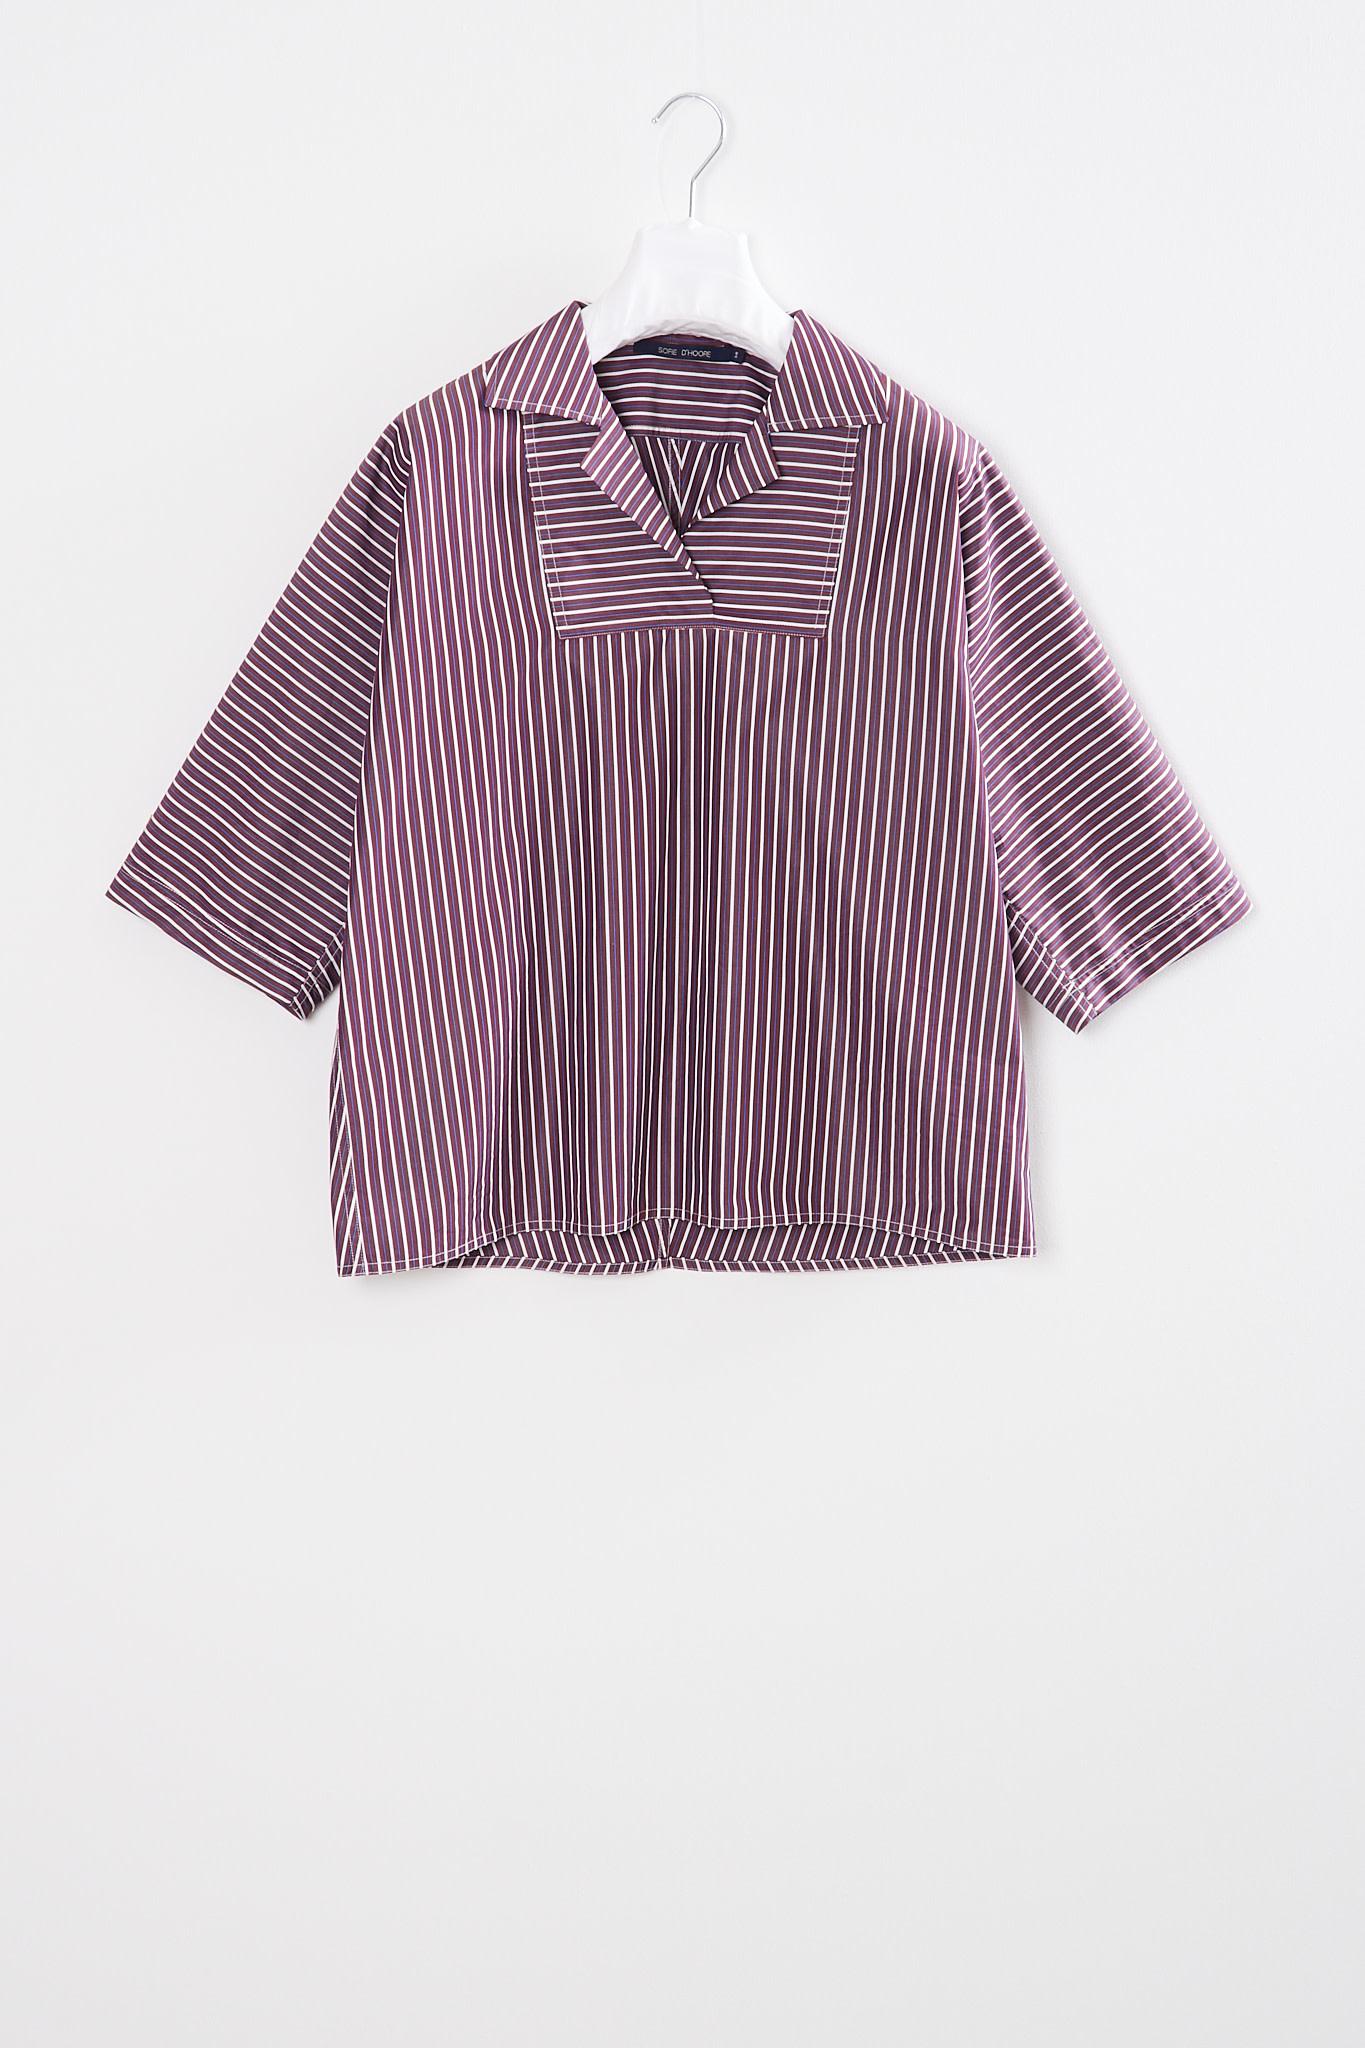 Sofie d'Hoore - Book striped cotton shirt